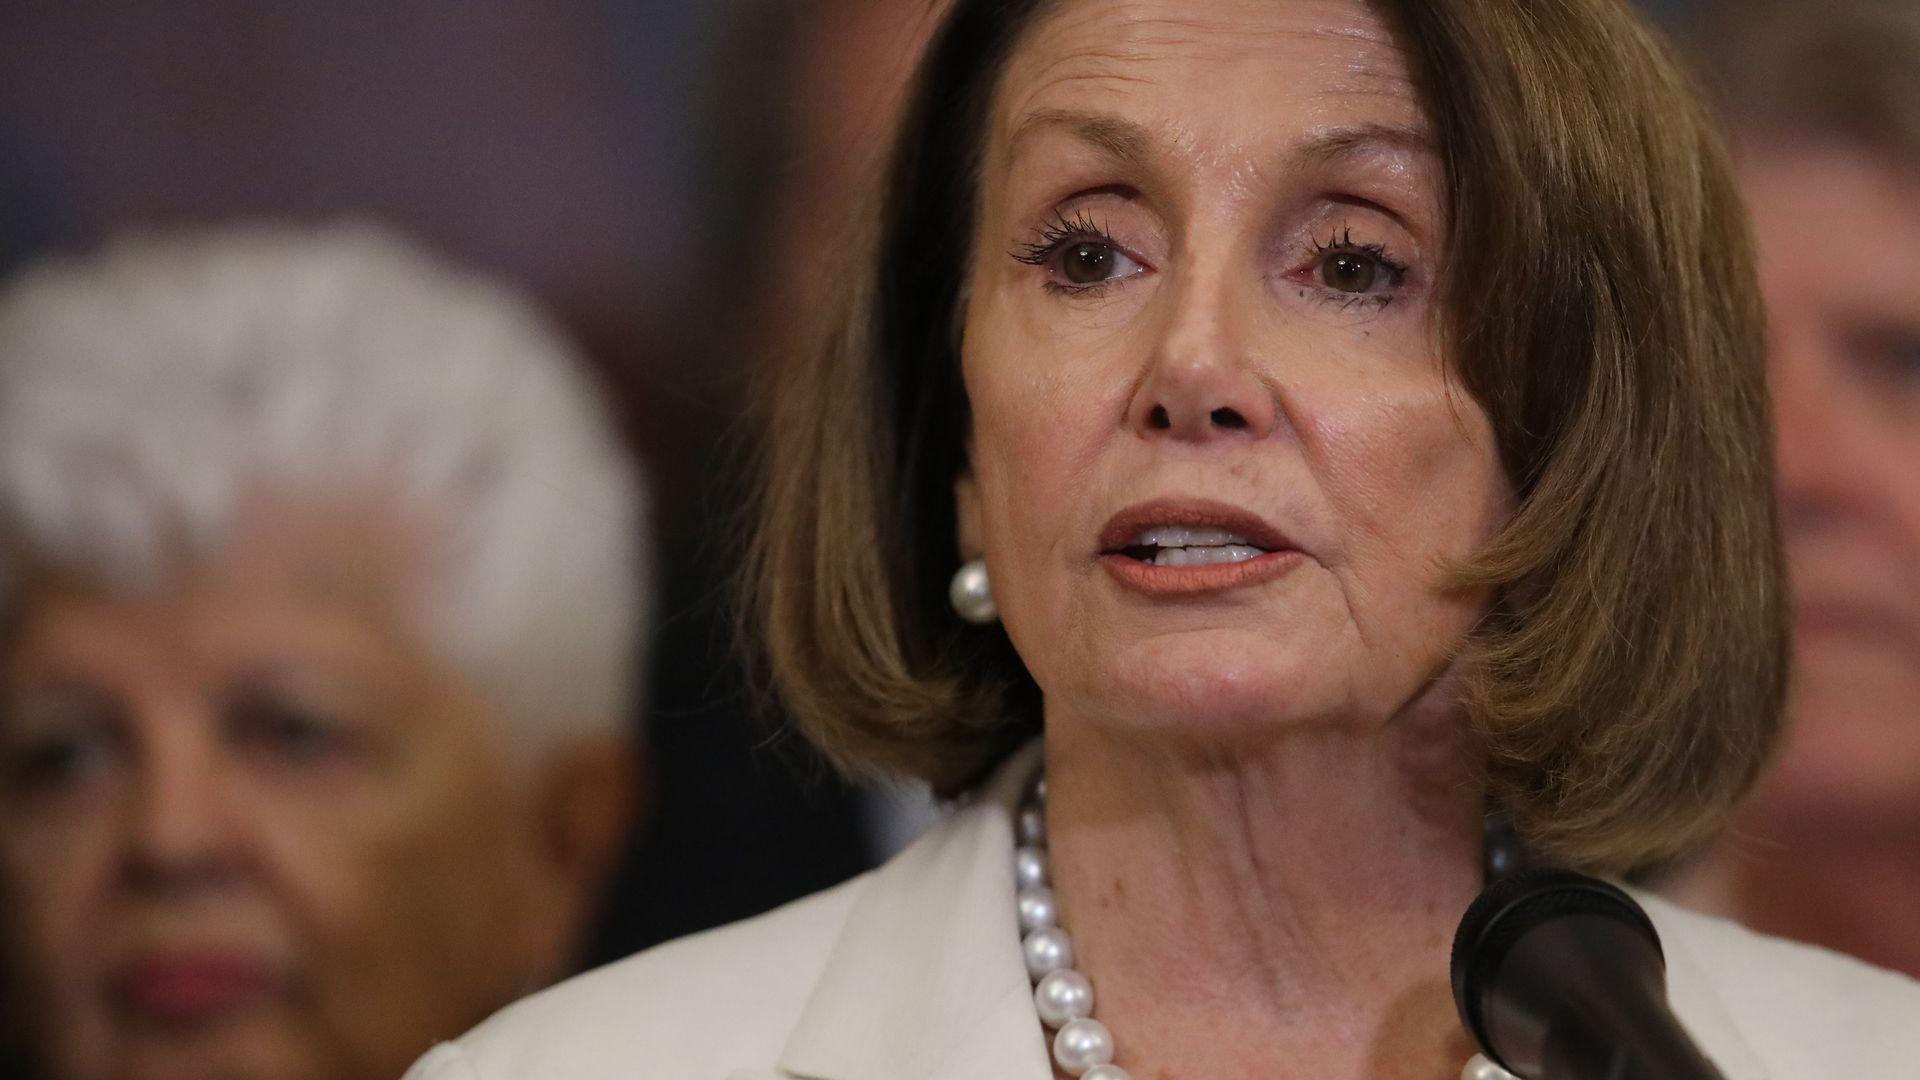 House Minority Leader Nancy Pelosi speaks on Capitol Hill